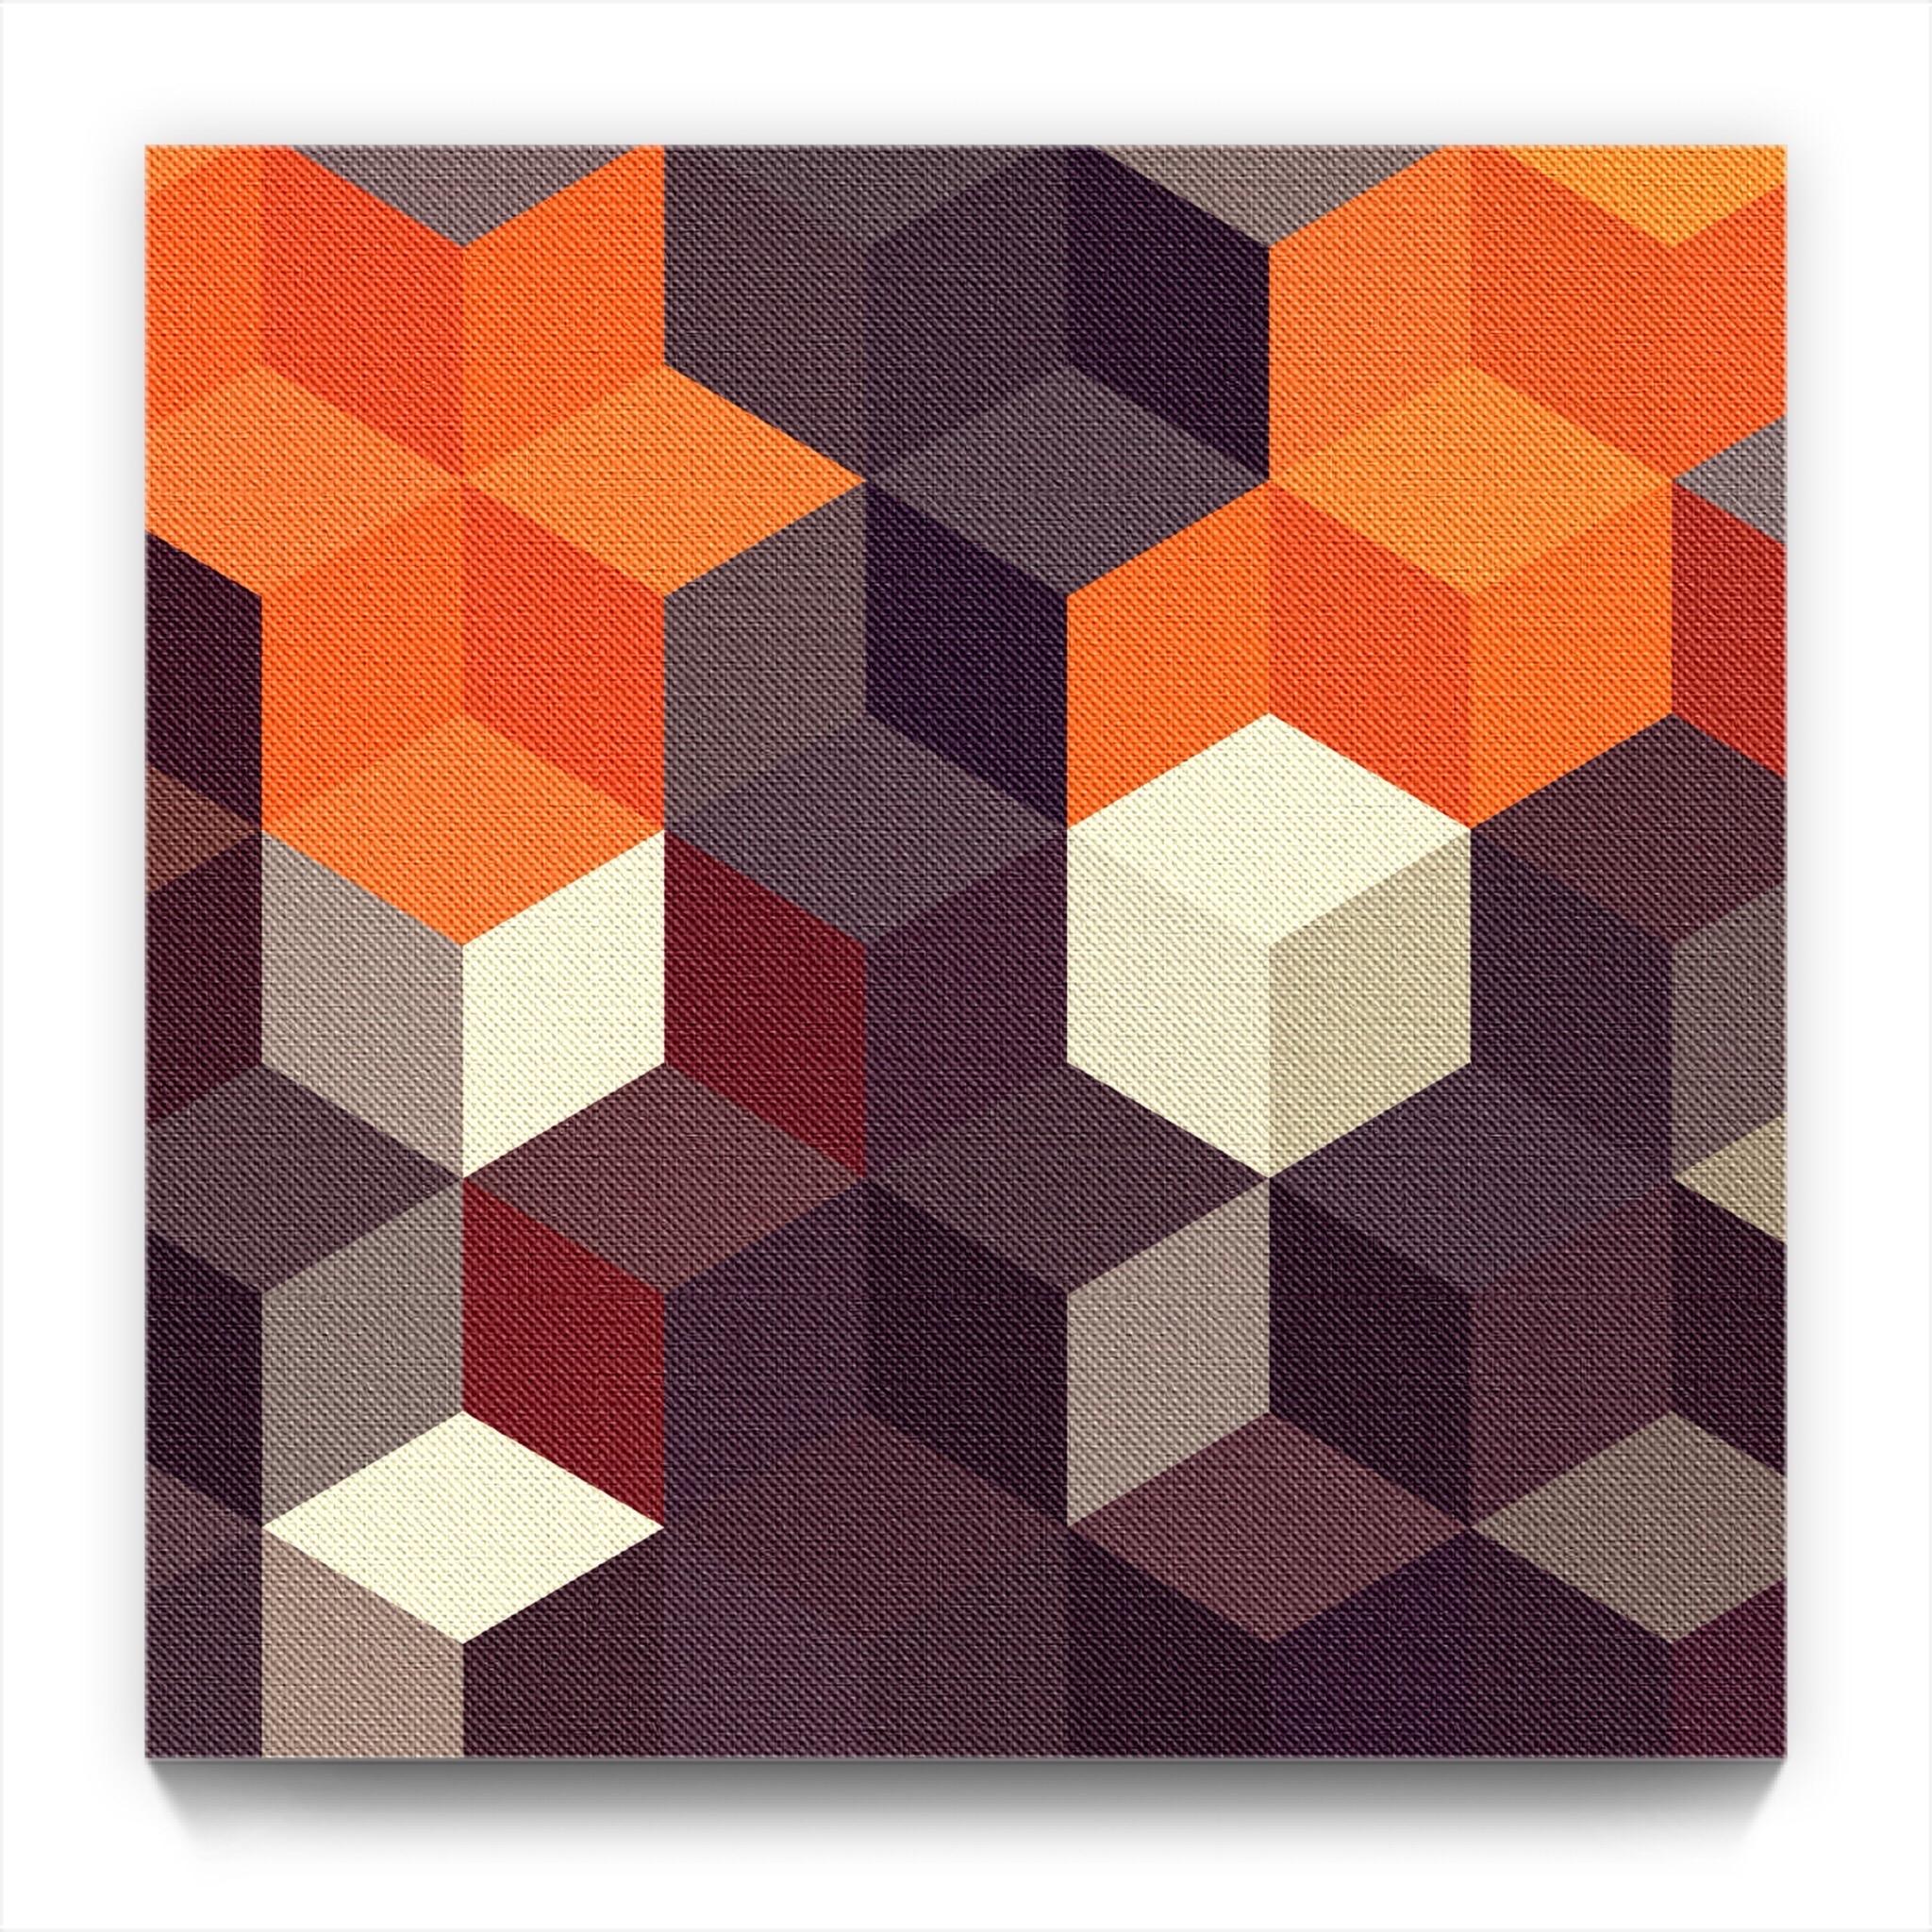 DiMiSiT 19 . 3 . Geometric iPhone Art by newmedia iPad Artist Mark Sedgwick